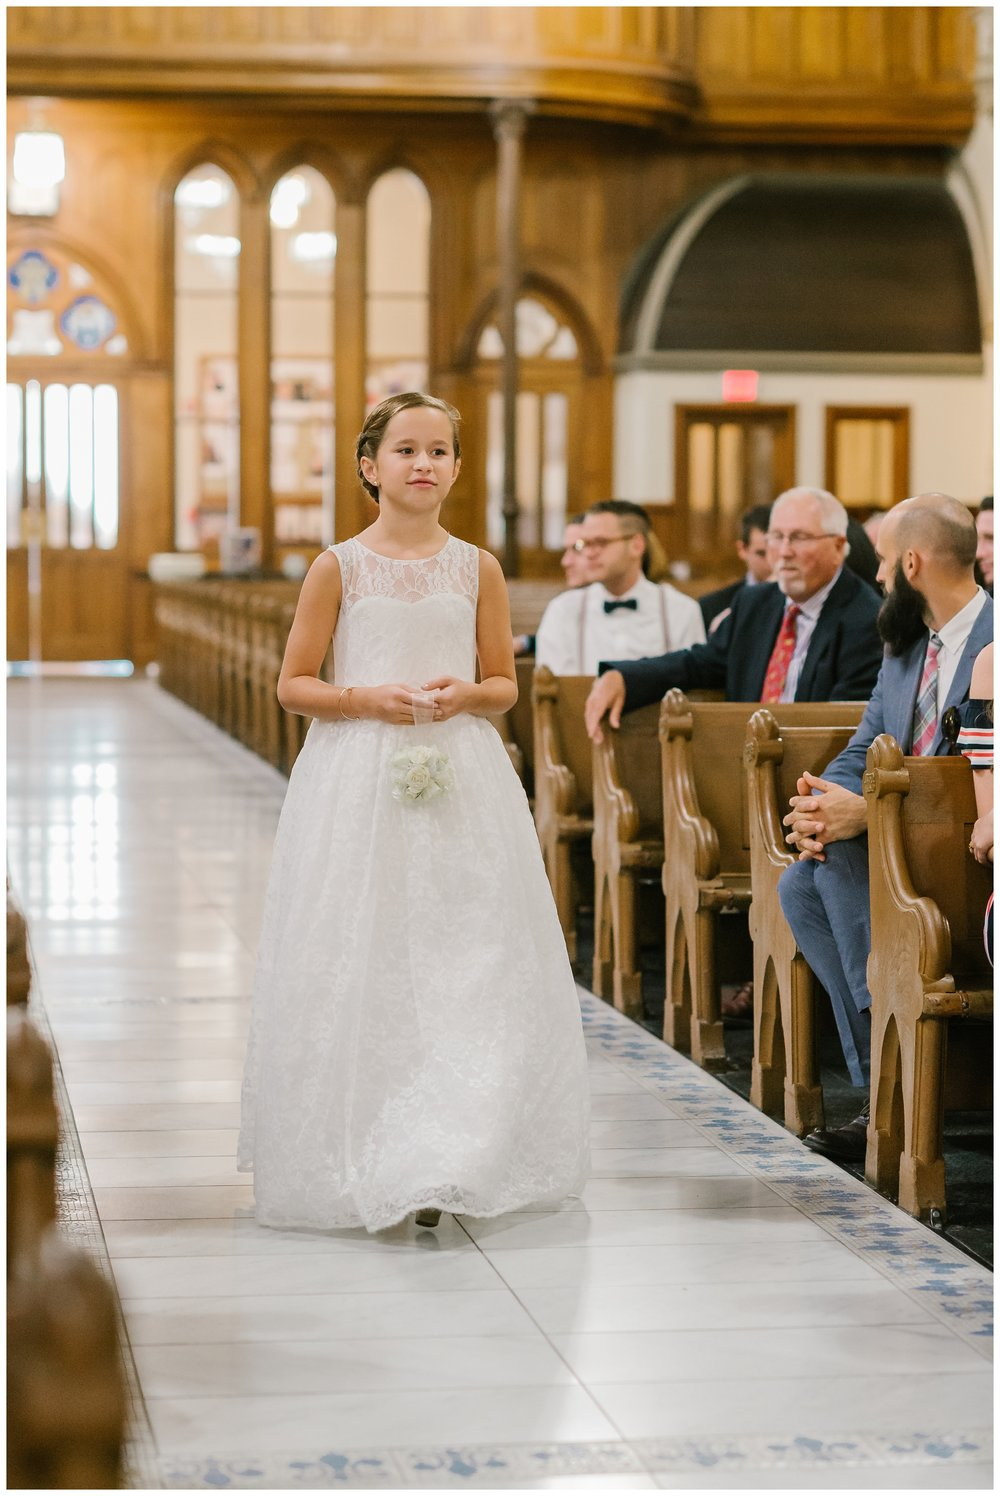 Rebecca_Bridges_Photography_Indianapolis_Wedding_Photographer_6796.jpg